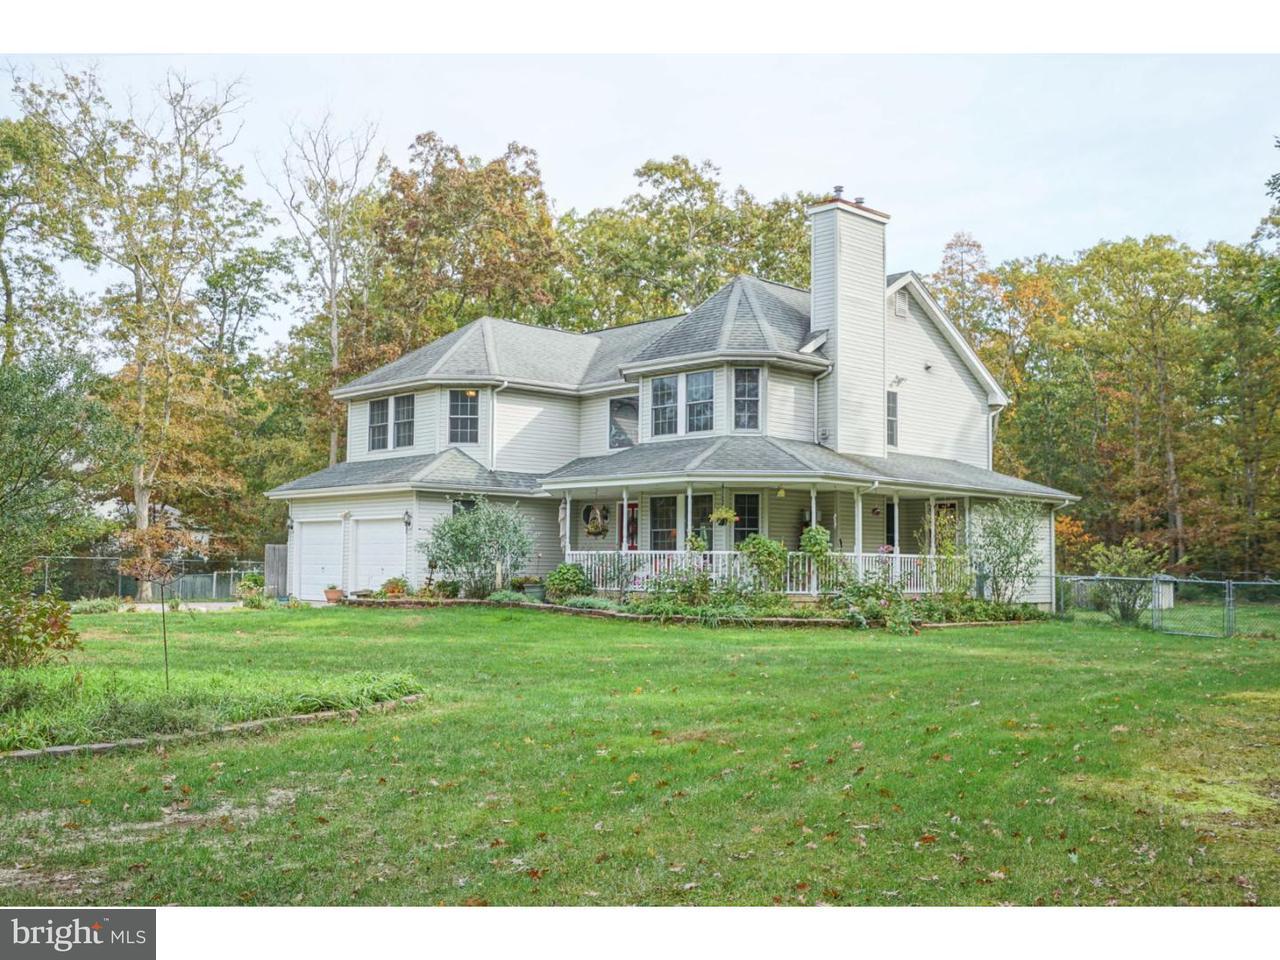 独户住宅 为 销售 在 3 HAY Road Little Egg Harbor, 新泽西州 08087 美国